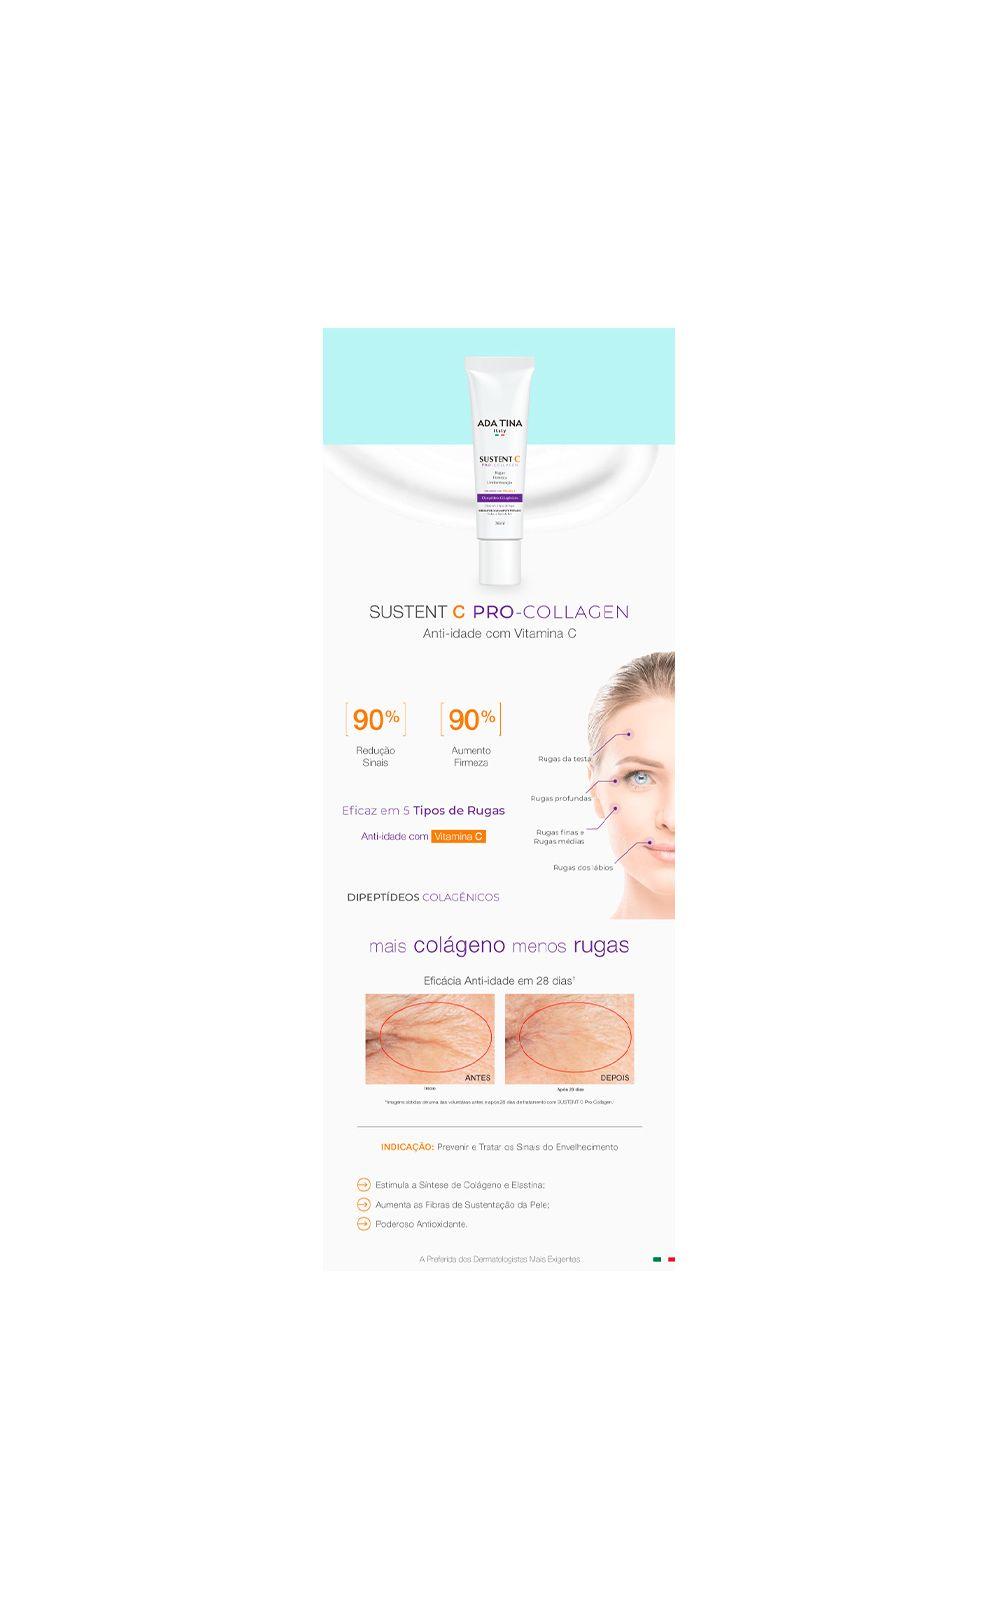 Foto 3 - Rejuvenescedor Facial Ada Tina Sustent C Pro Collagen - 30ml